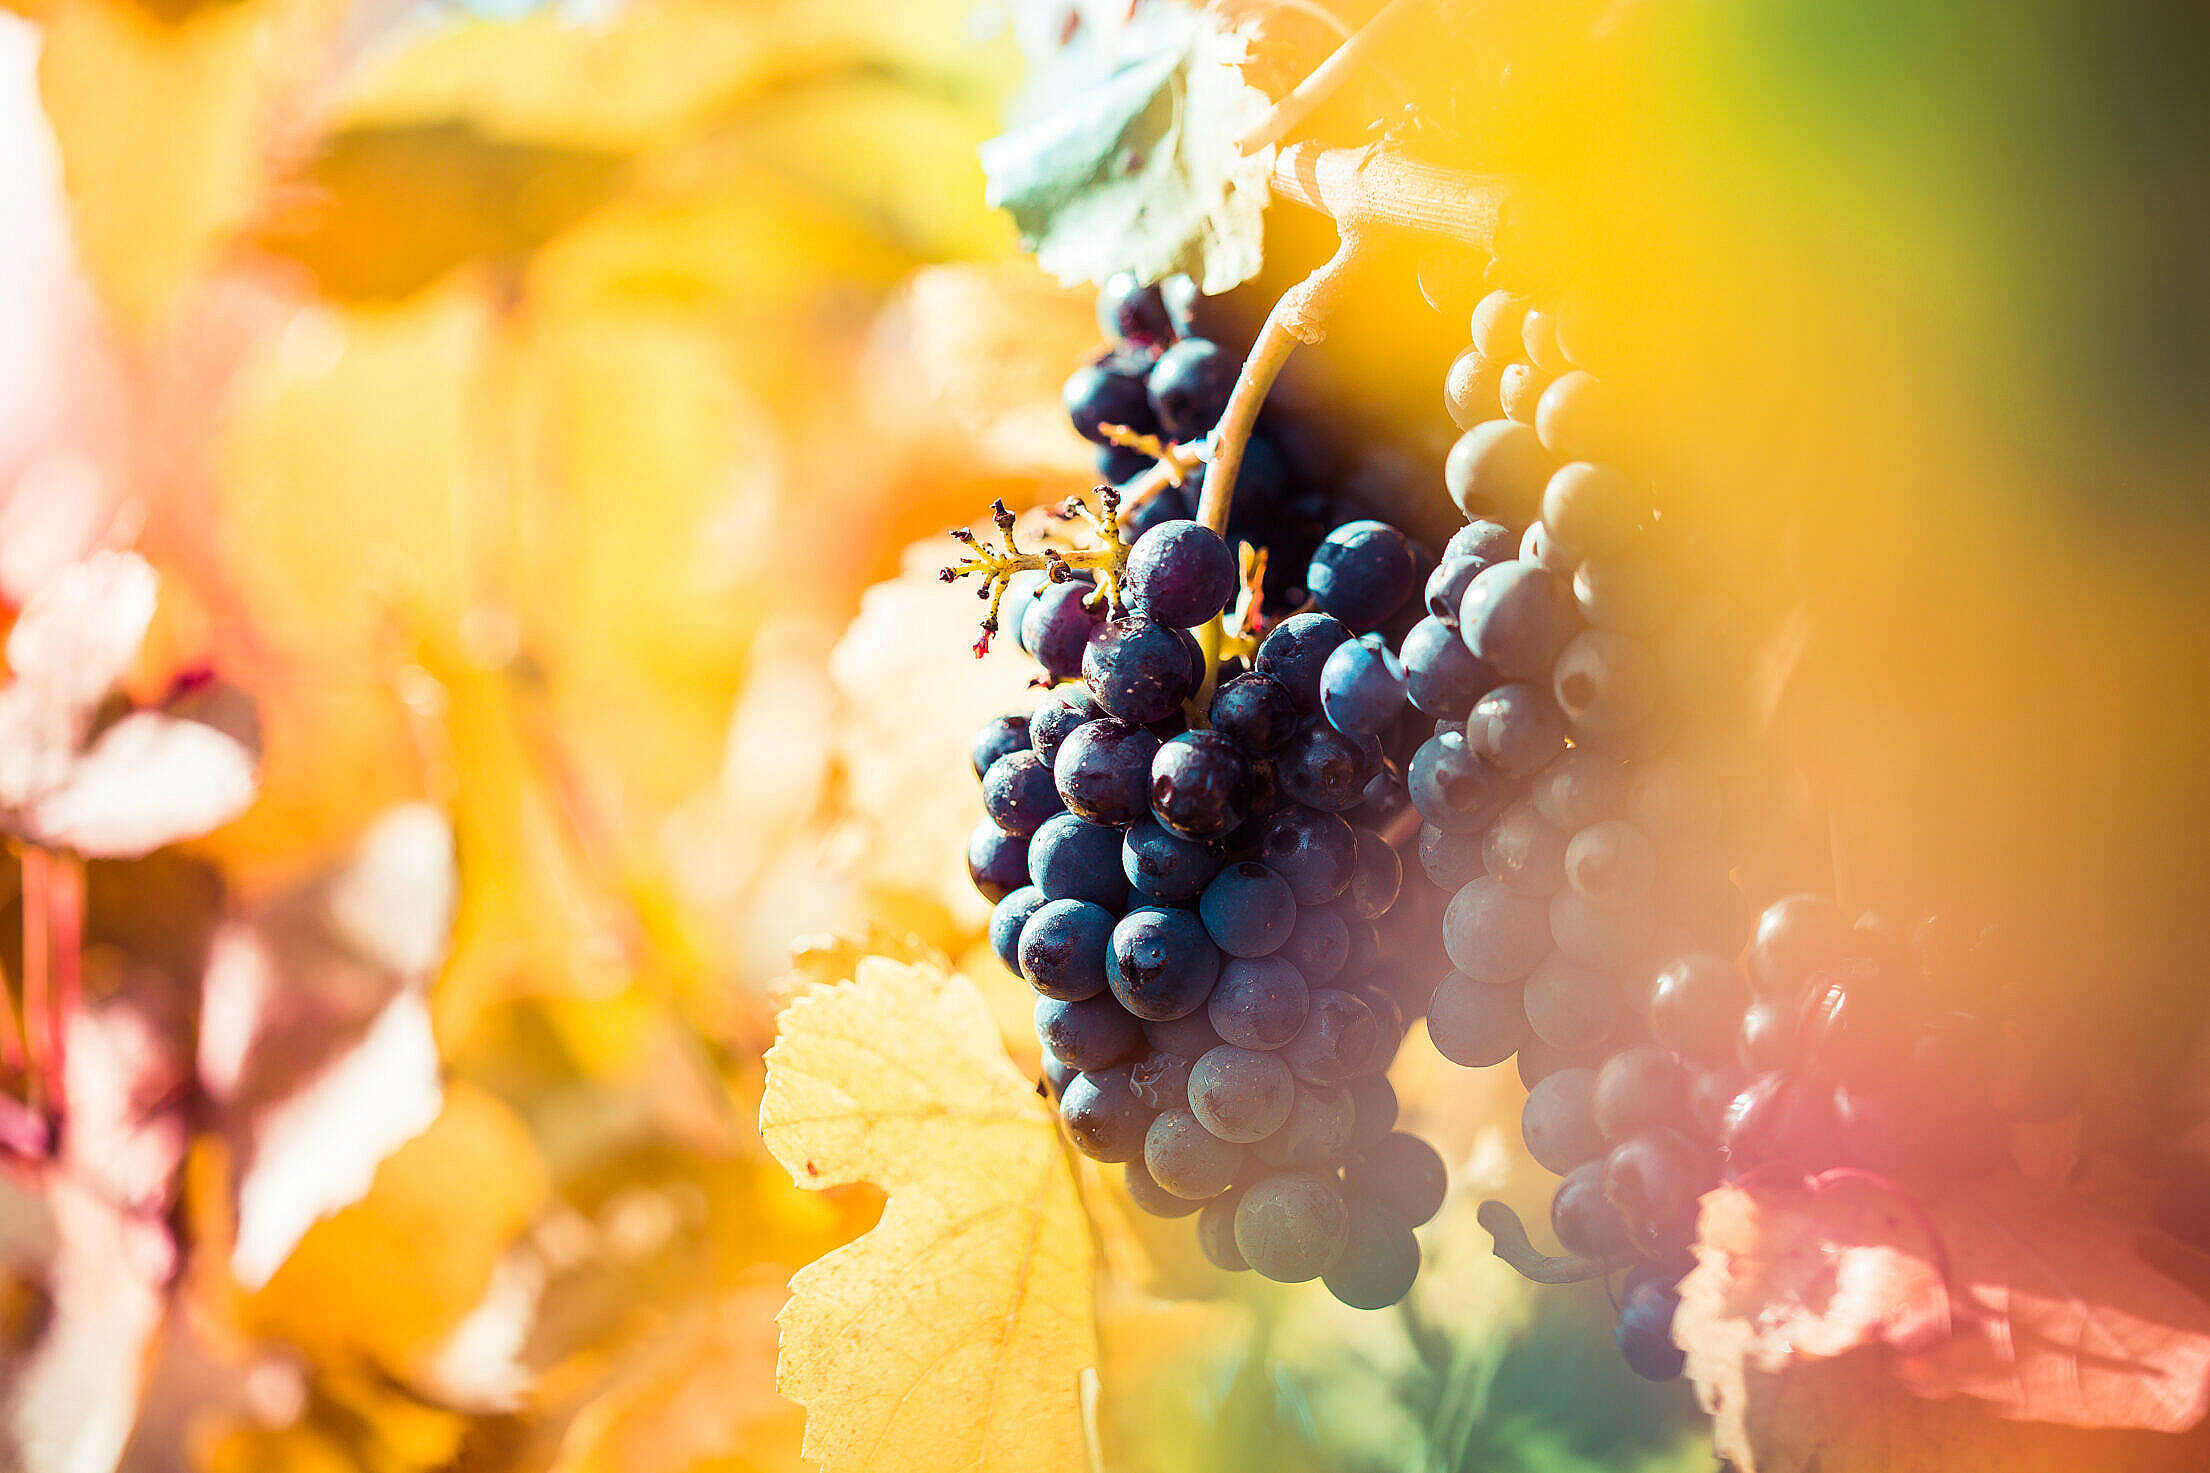 Ripe Wine Grapes in Vineyard Field Free Stock Photo